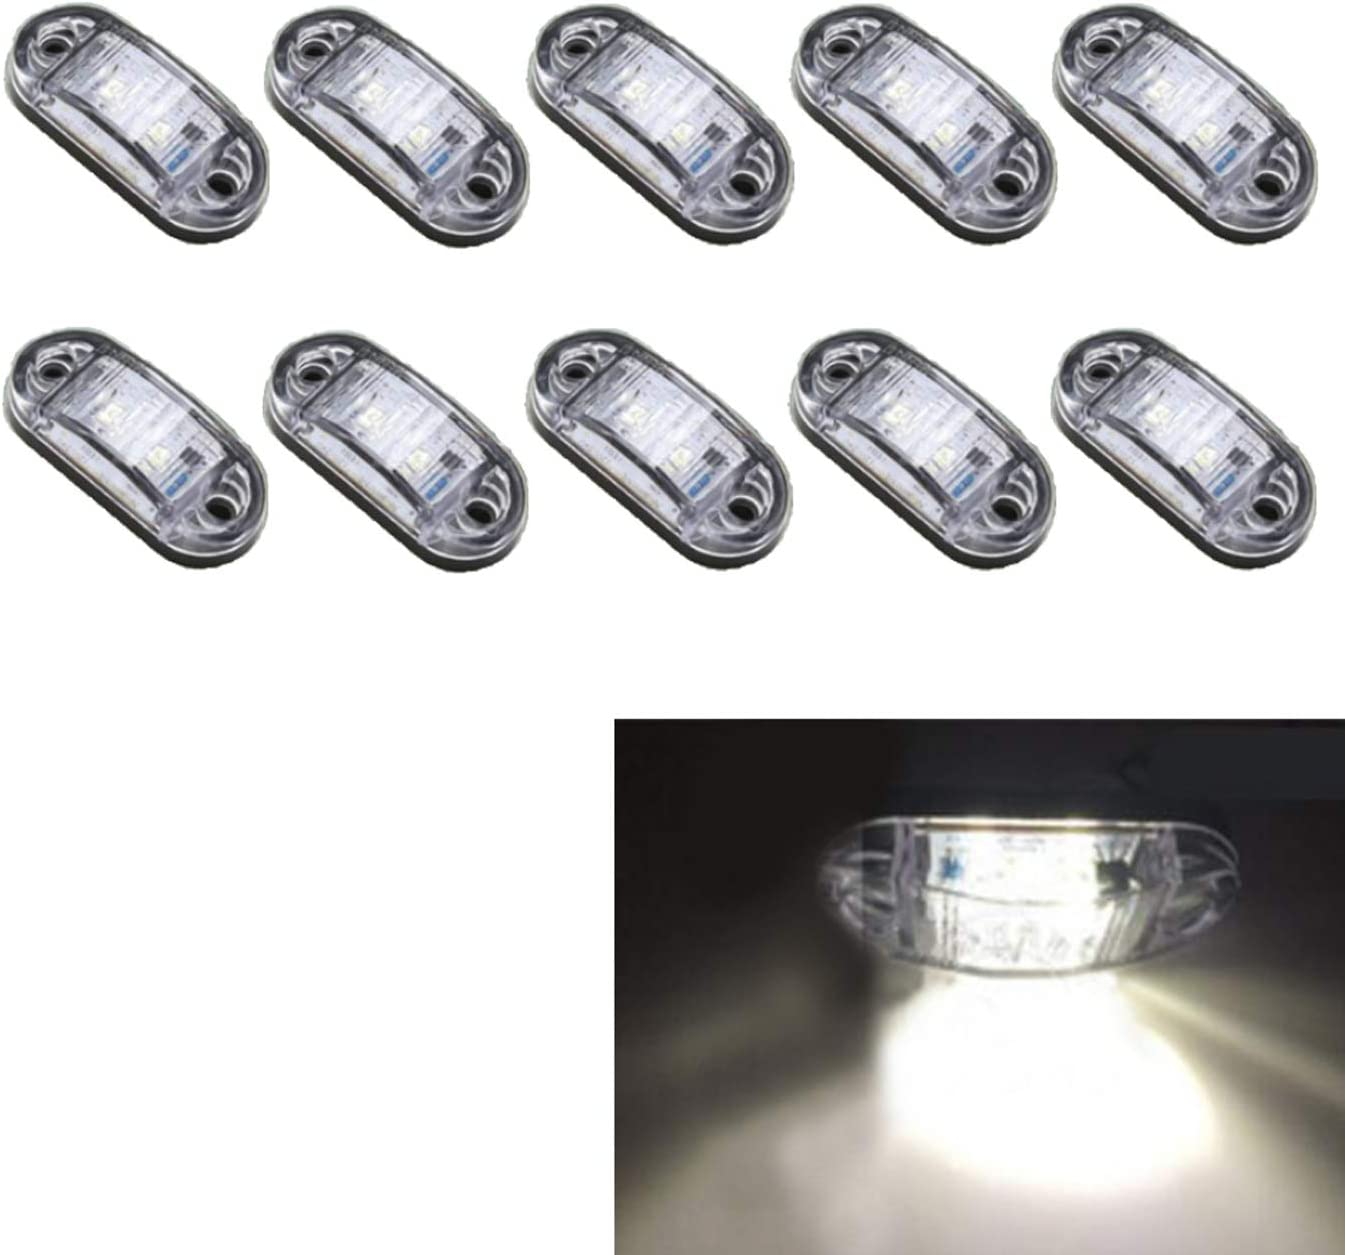 MuChangZi 10pcs LED Side Marker Light Despeje la lámpara 12V 24V Car Truck Trailer Bus Luz Trasera Luces de estacionamiento (Blanco)